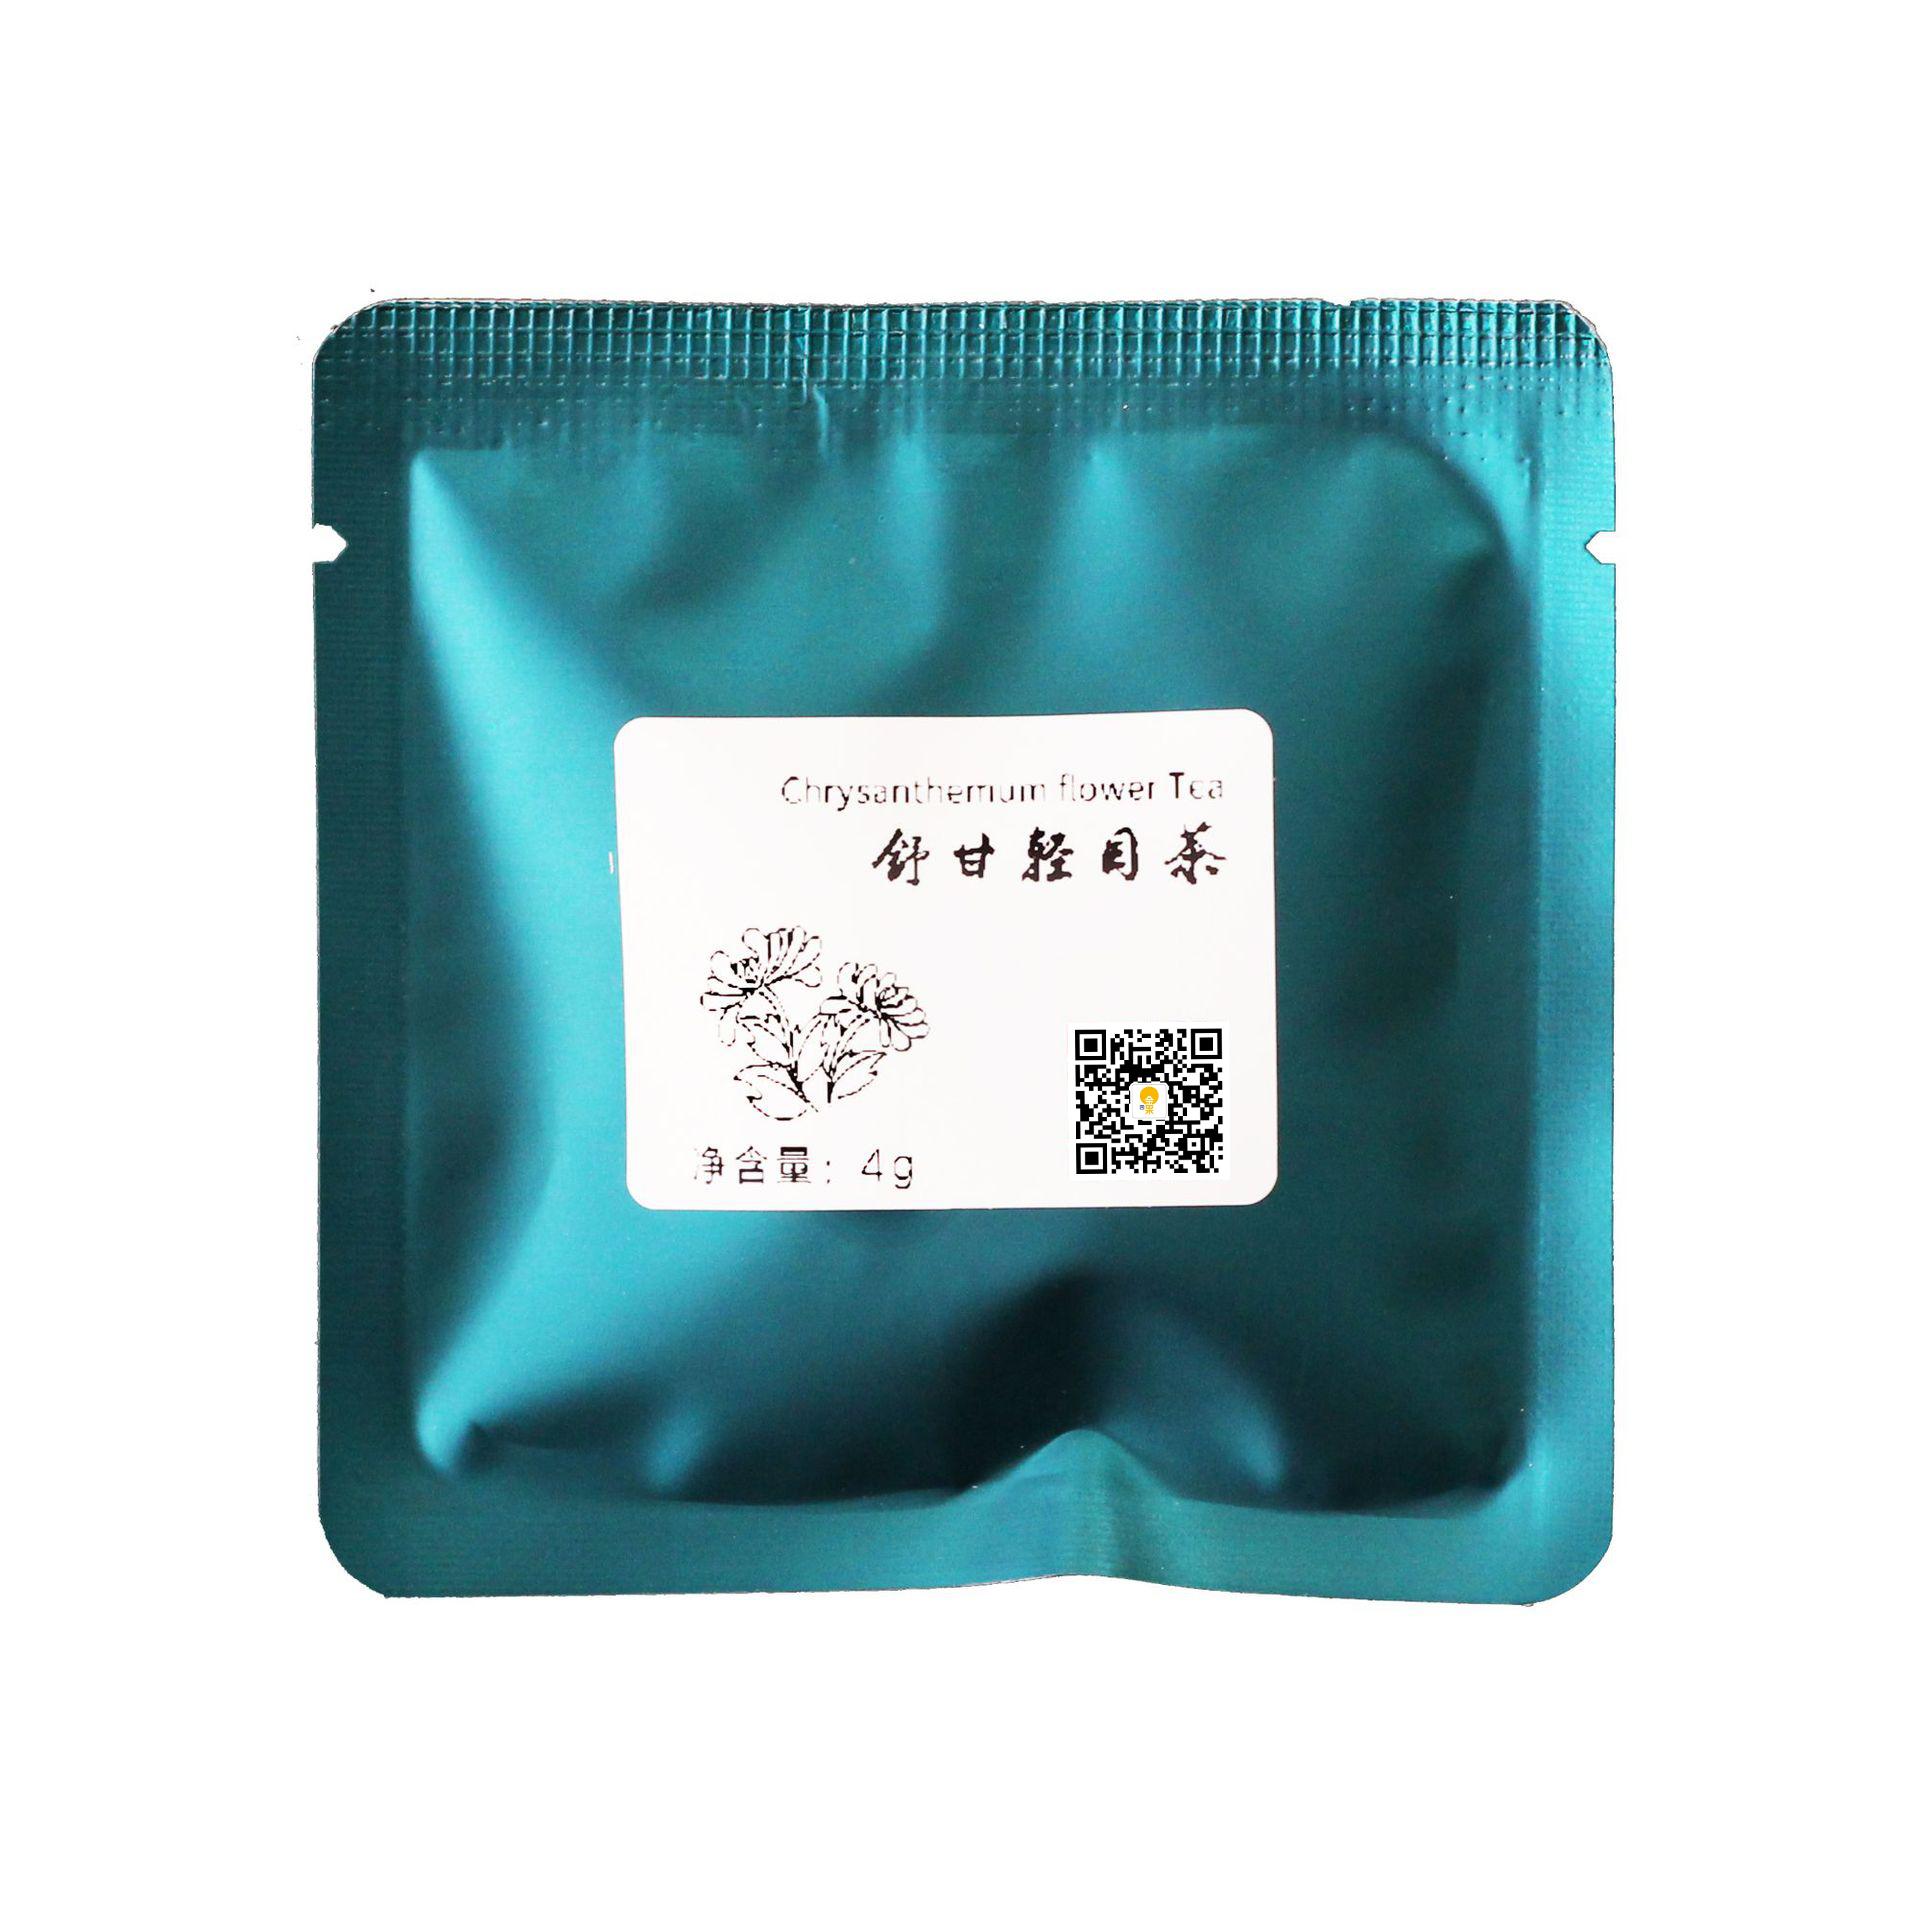 Chinese herbal Formulas Chrysanthemum Matrimony Vine Folium Mori Loose Leaf Tea Triangle Detox Tea Bag for Improving Eyesight - 4uTea   4uTea.com